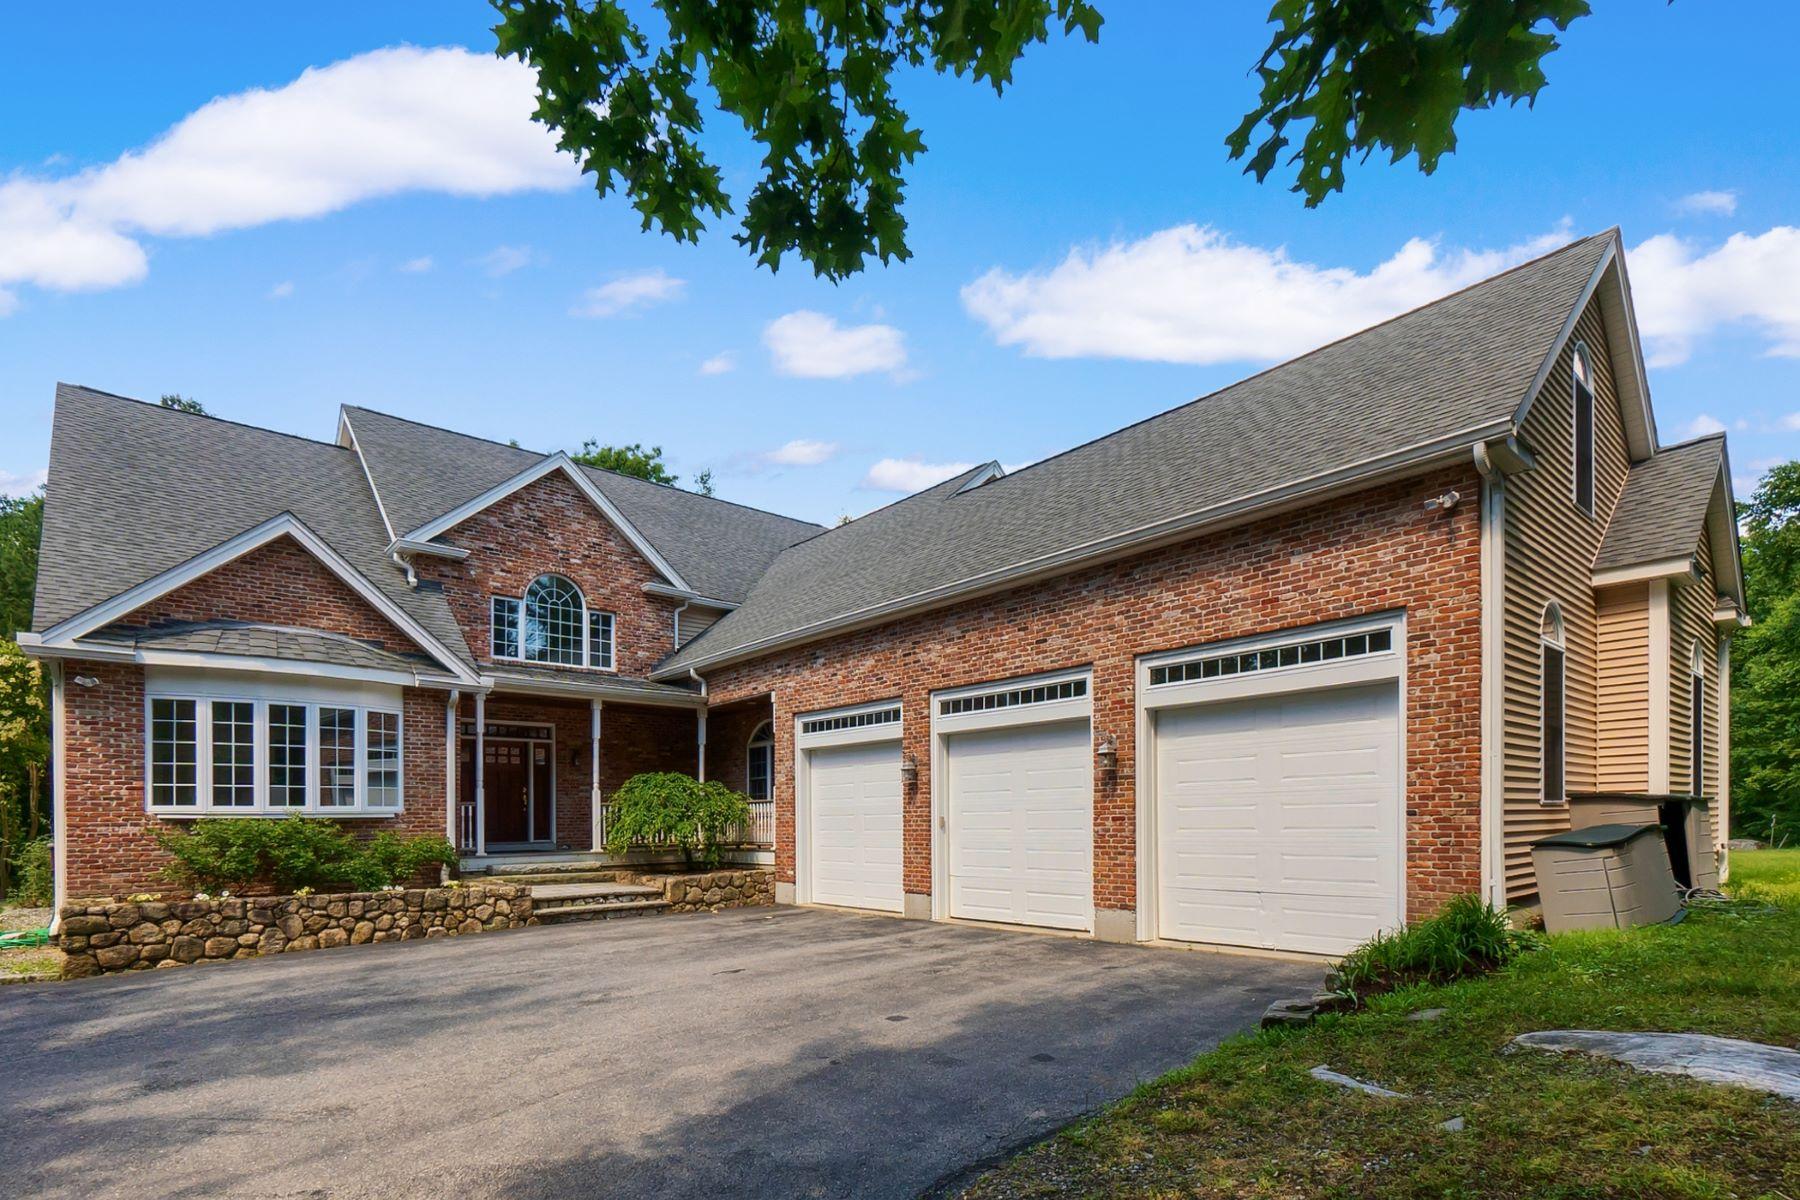 Single Family Homes για την Πώληση στο 607 Burroughs Rd, Boxborough Boxborough, Μασαχουσετη 01719 Ηνωμένες Πολιτείες